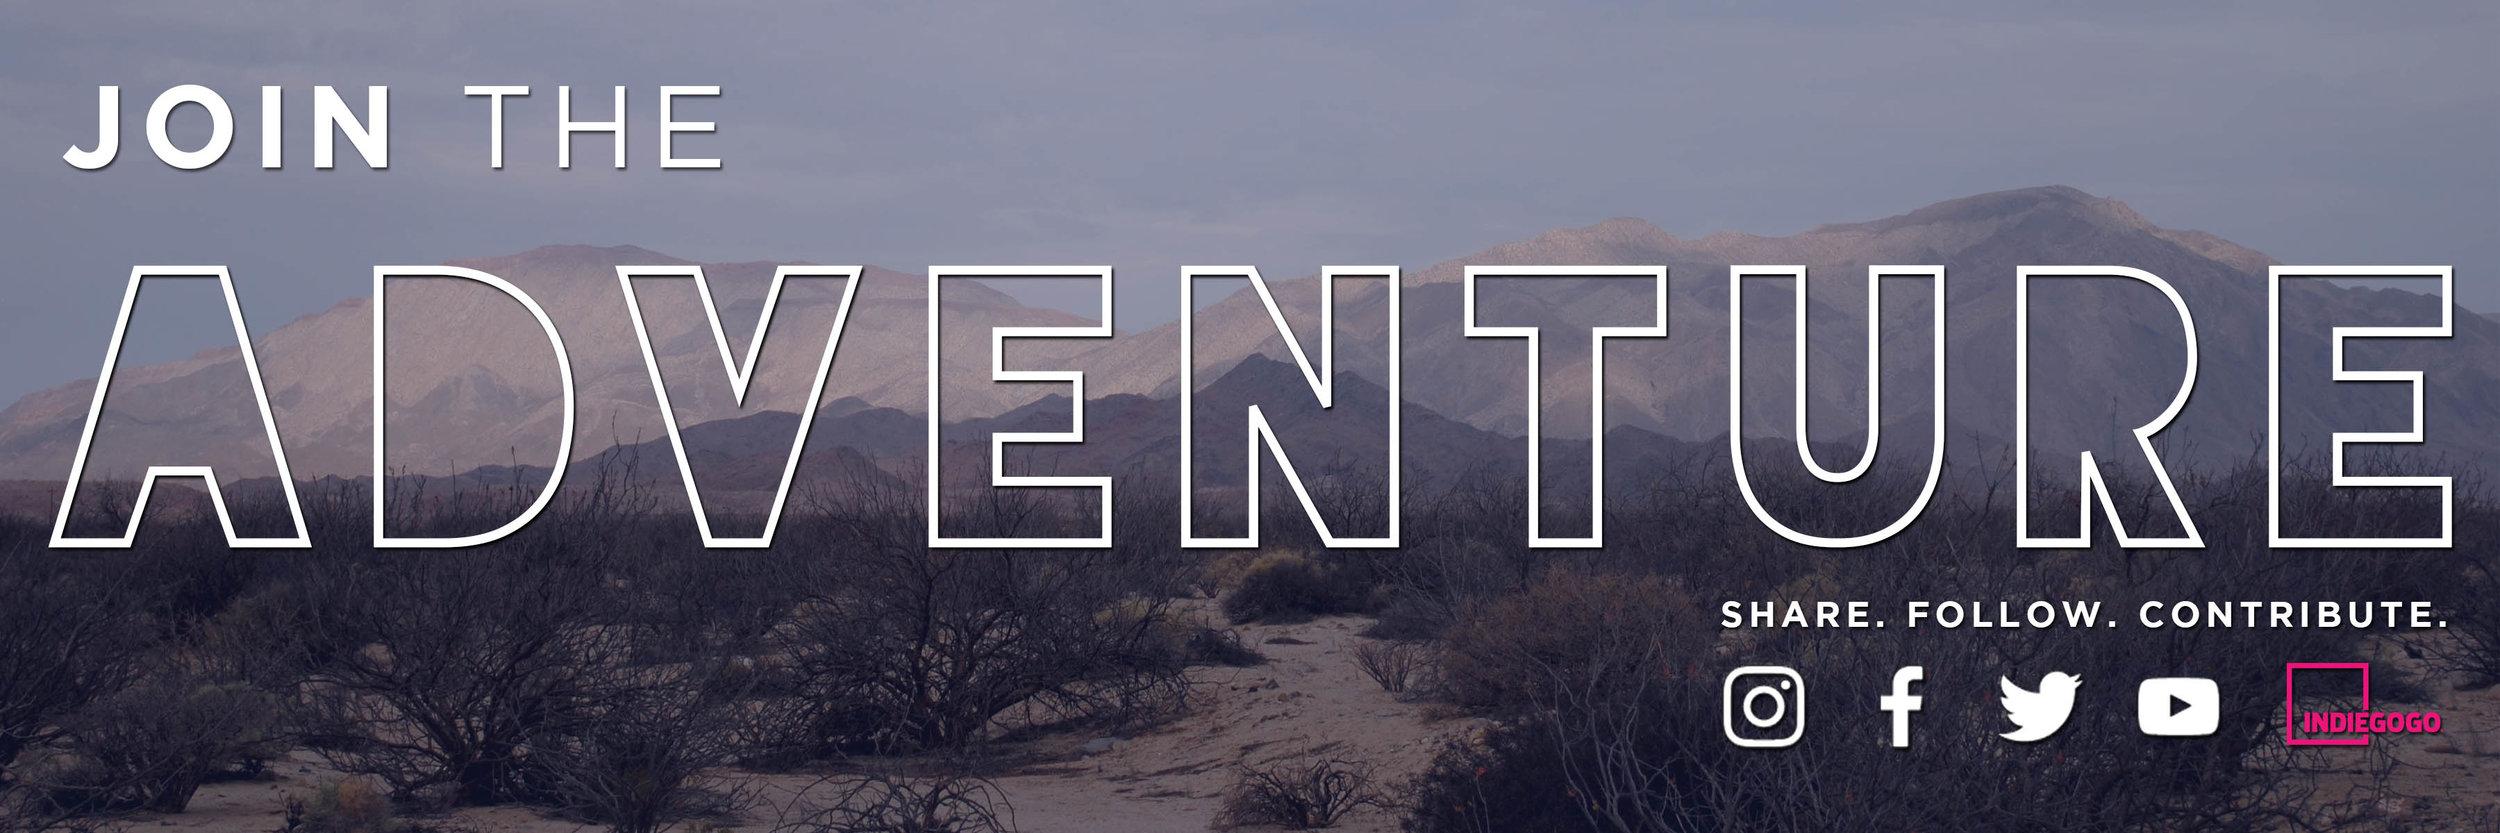 JointheAdventure_triptic3.jpg